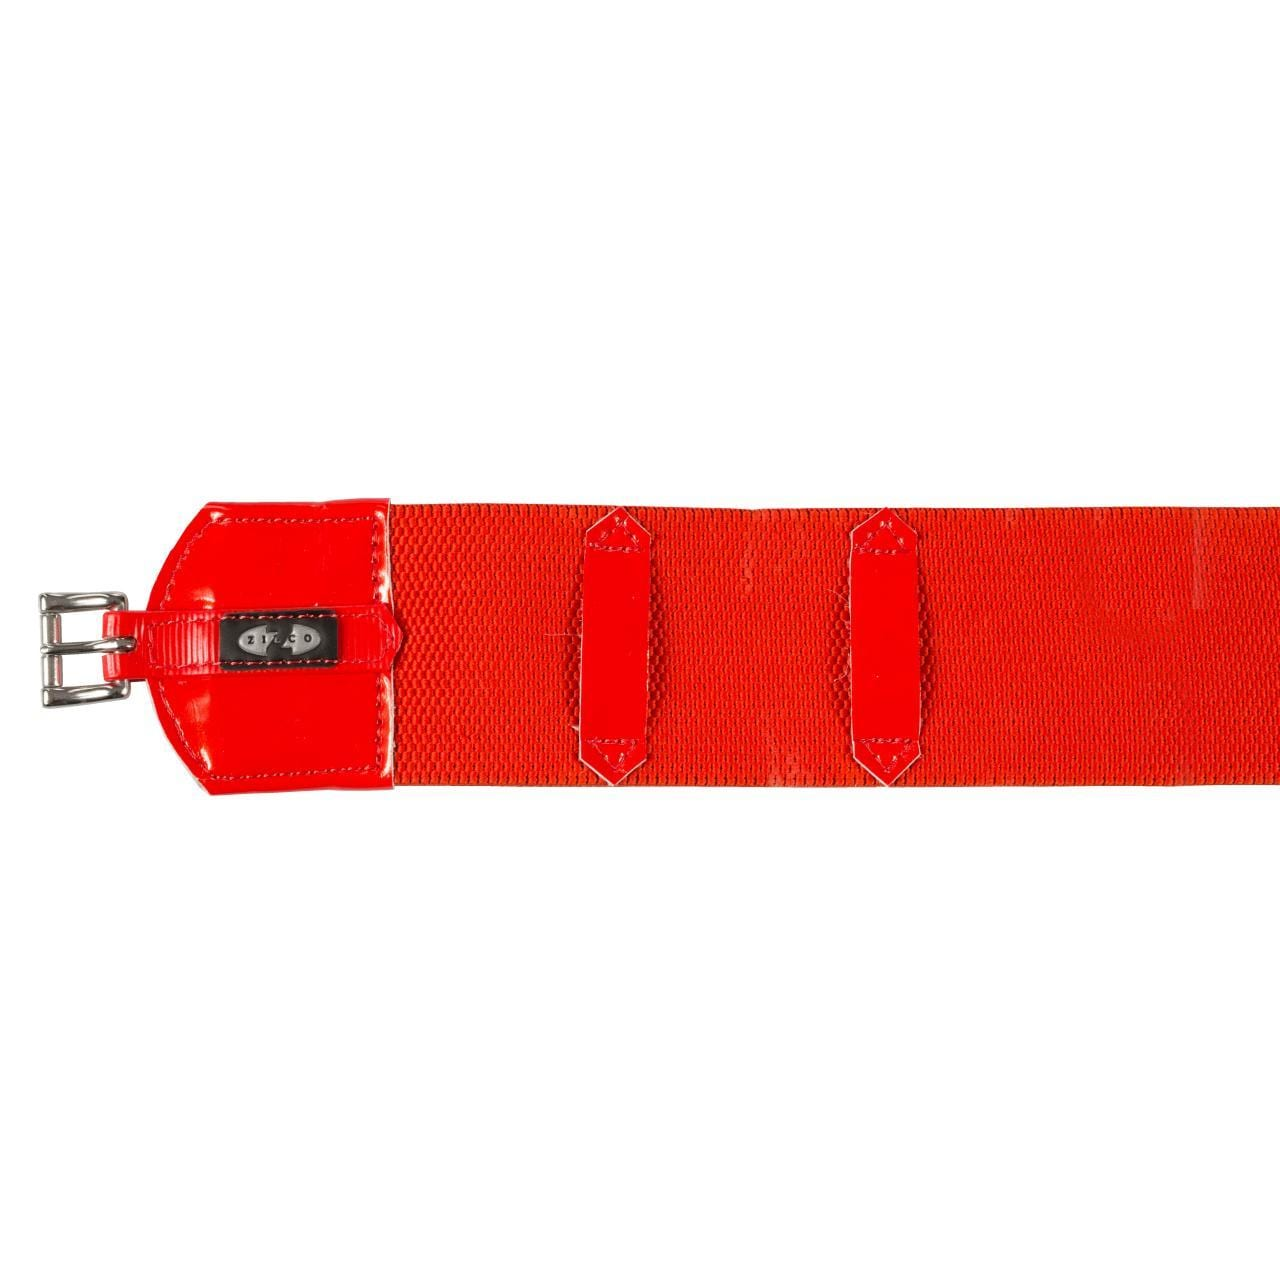 Zilco gjord dobbel elastikk 75mm STD